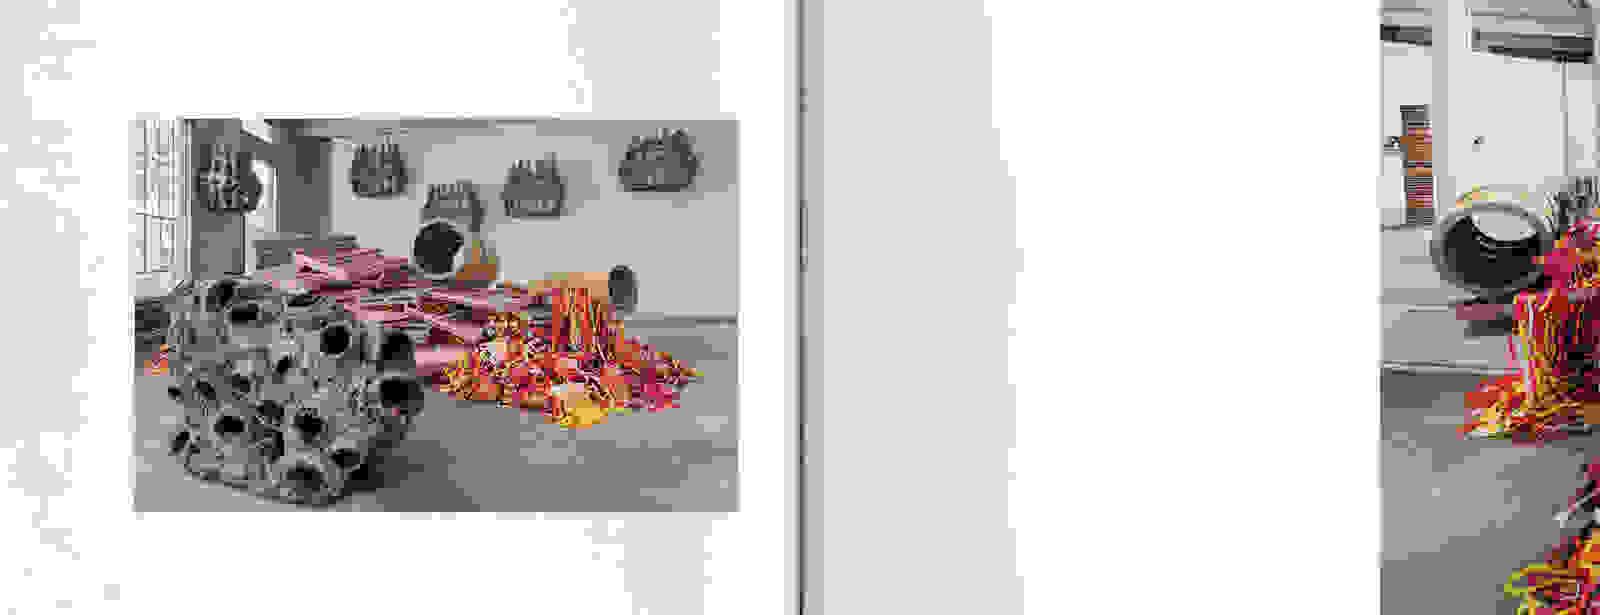 Phyllida Barlow DS 1600x615 4